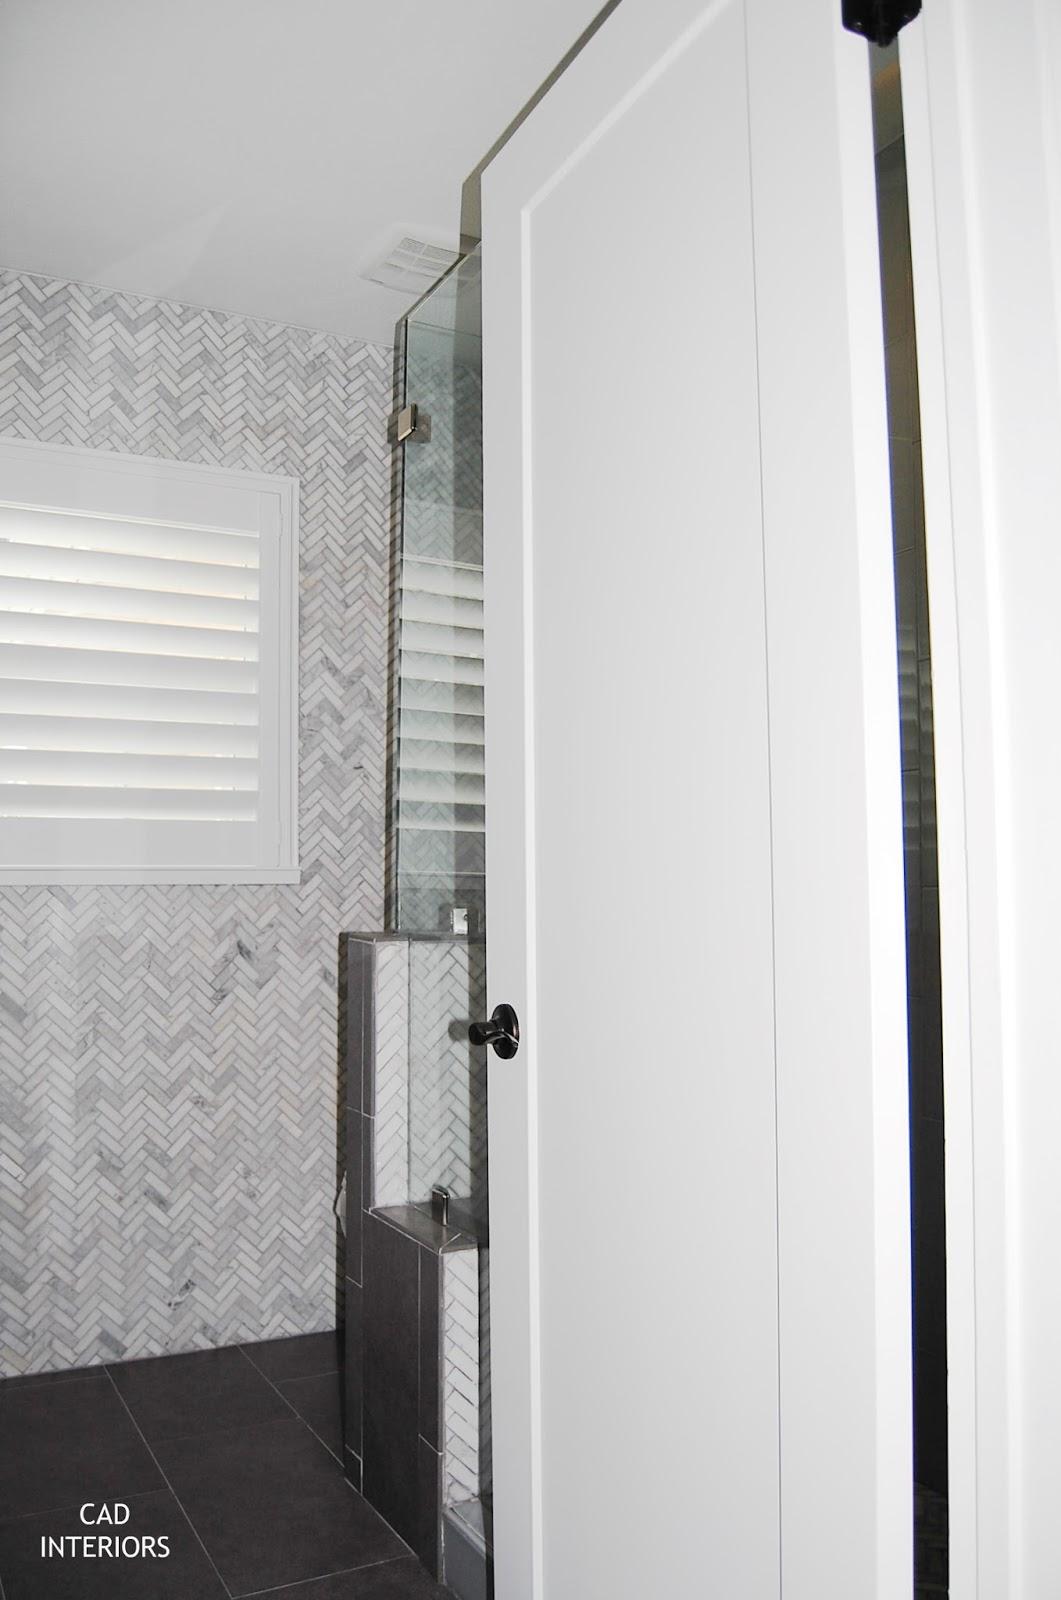 transitional classic modern bathroom interior design